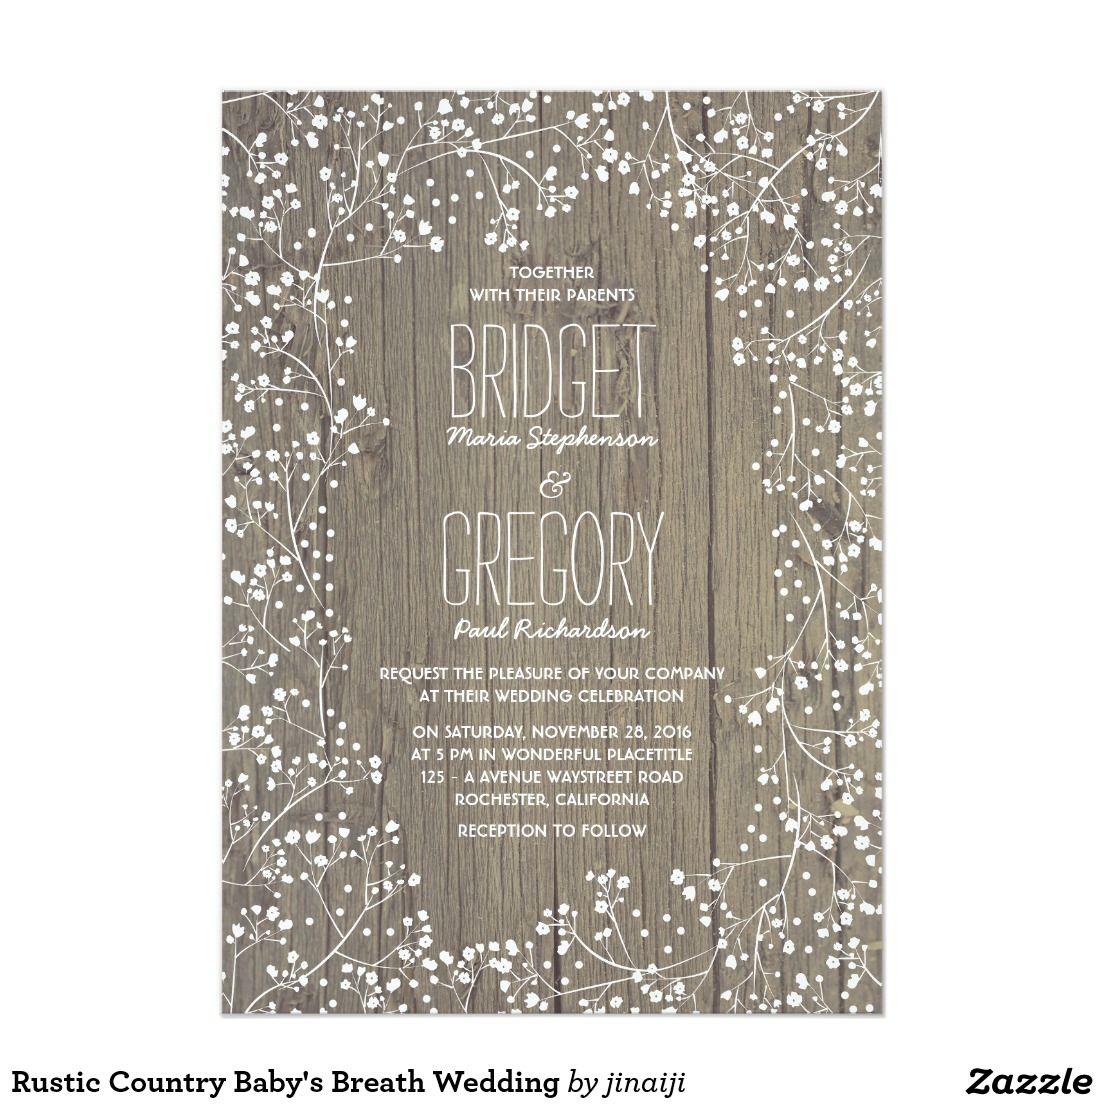 Rustic Country Baby S Breath Wedding Invitation Zazzle Com Babys Breath Wedding Wedding Invitations Rustic Country Country Wedding Invitations